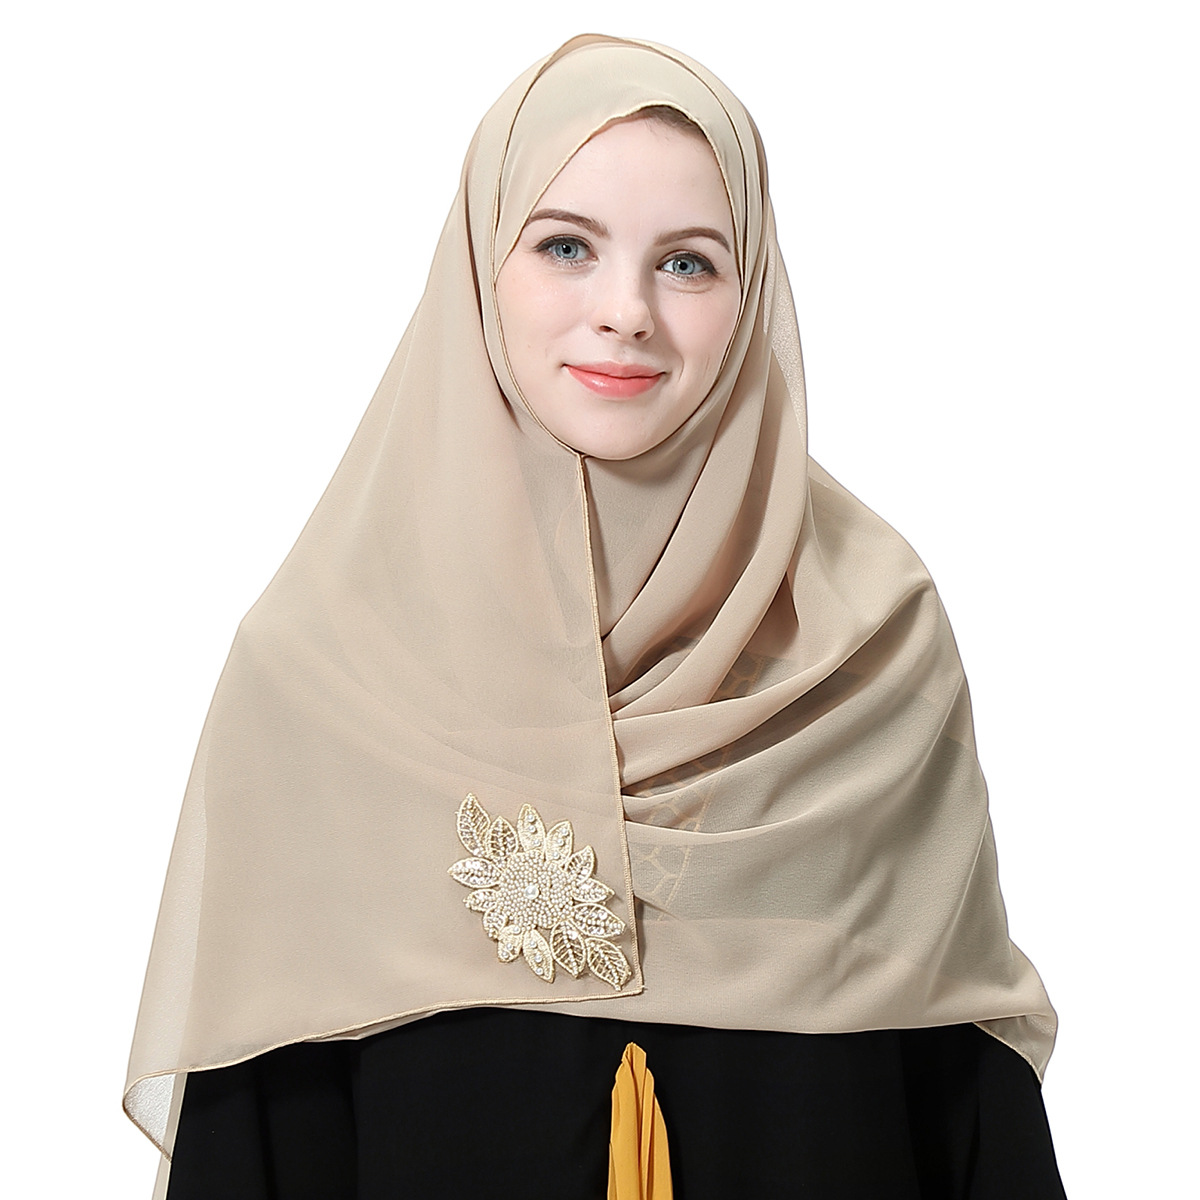 Women Breathable Chiffon Moslem Head Cover Cloth